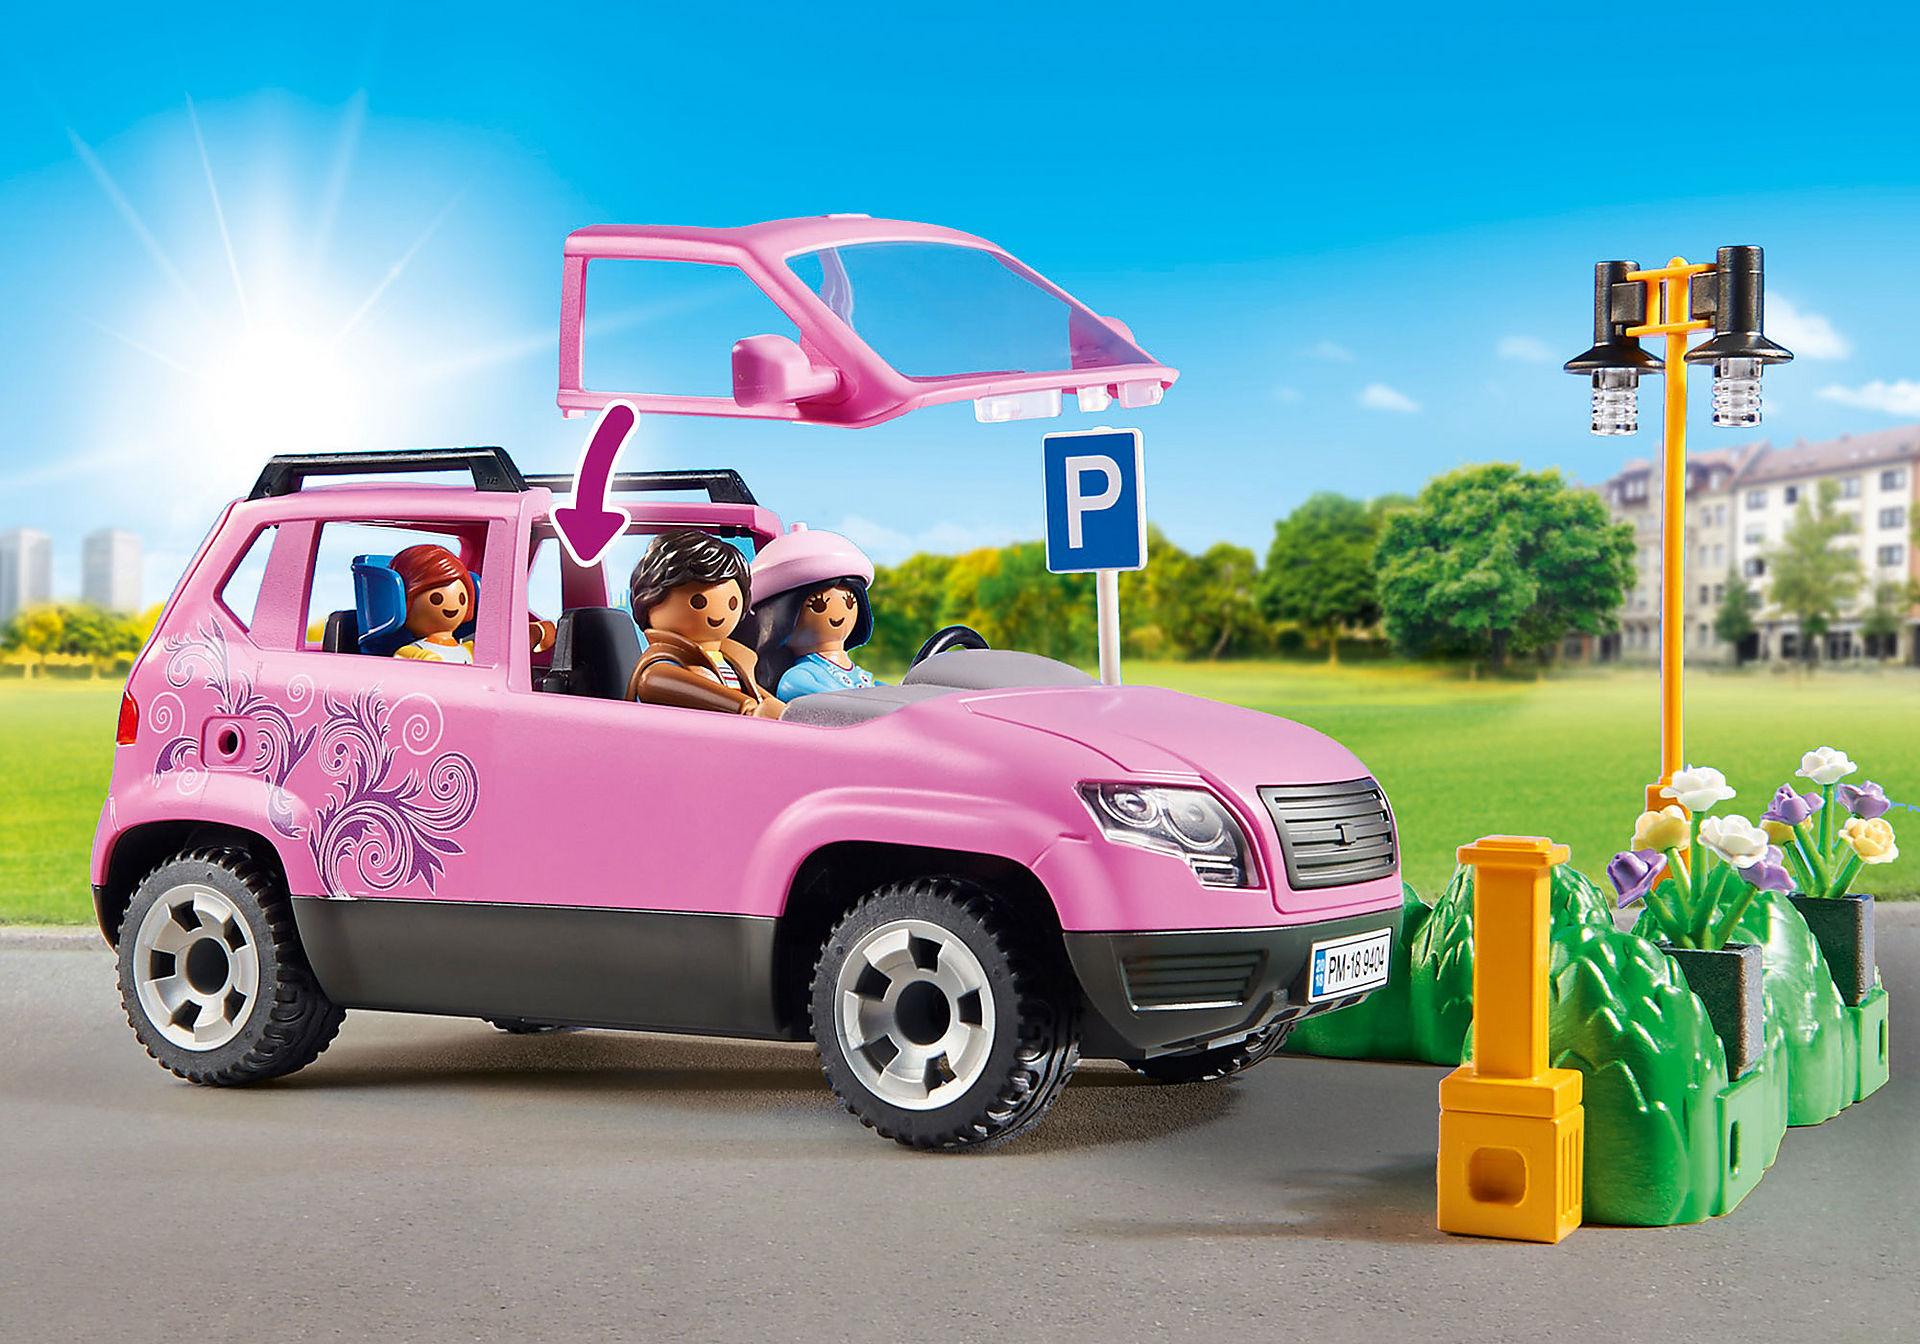 http://media.playmobil.com/i/playmobil/9404_product_extra2/Familiewagen met parkeerplaats